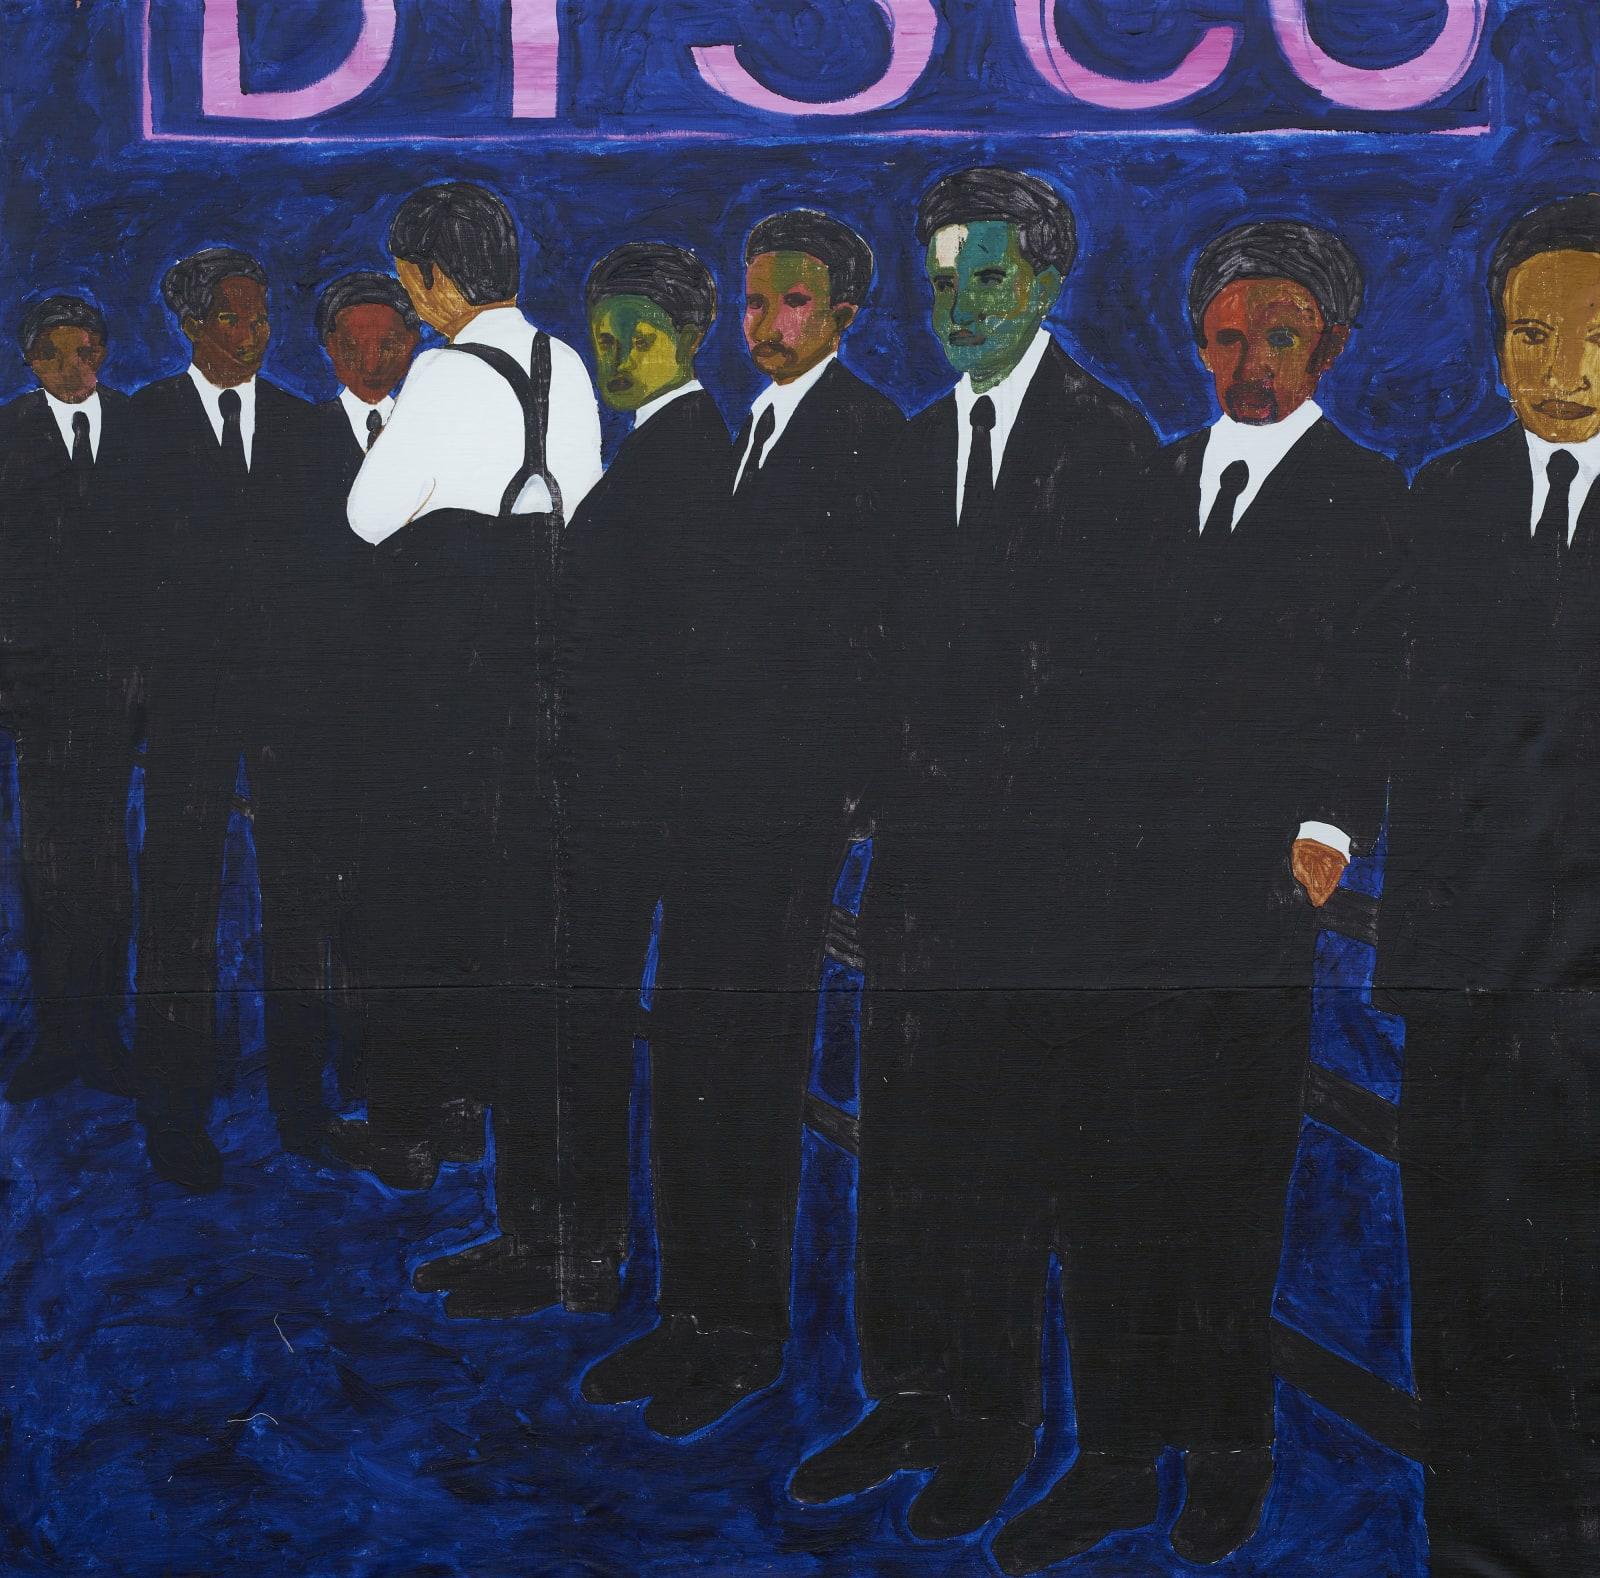 Gideon Appah, Disco, 2020